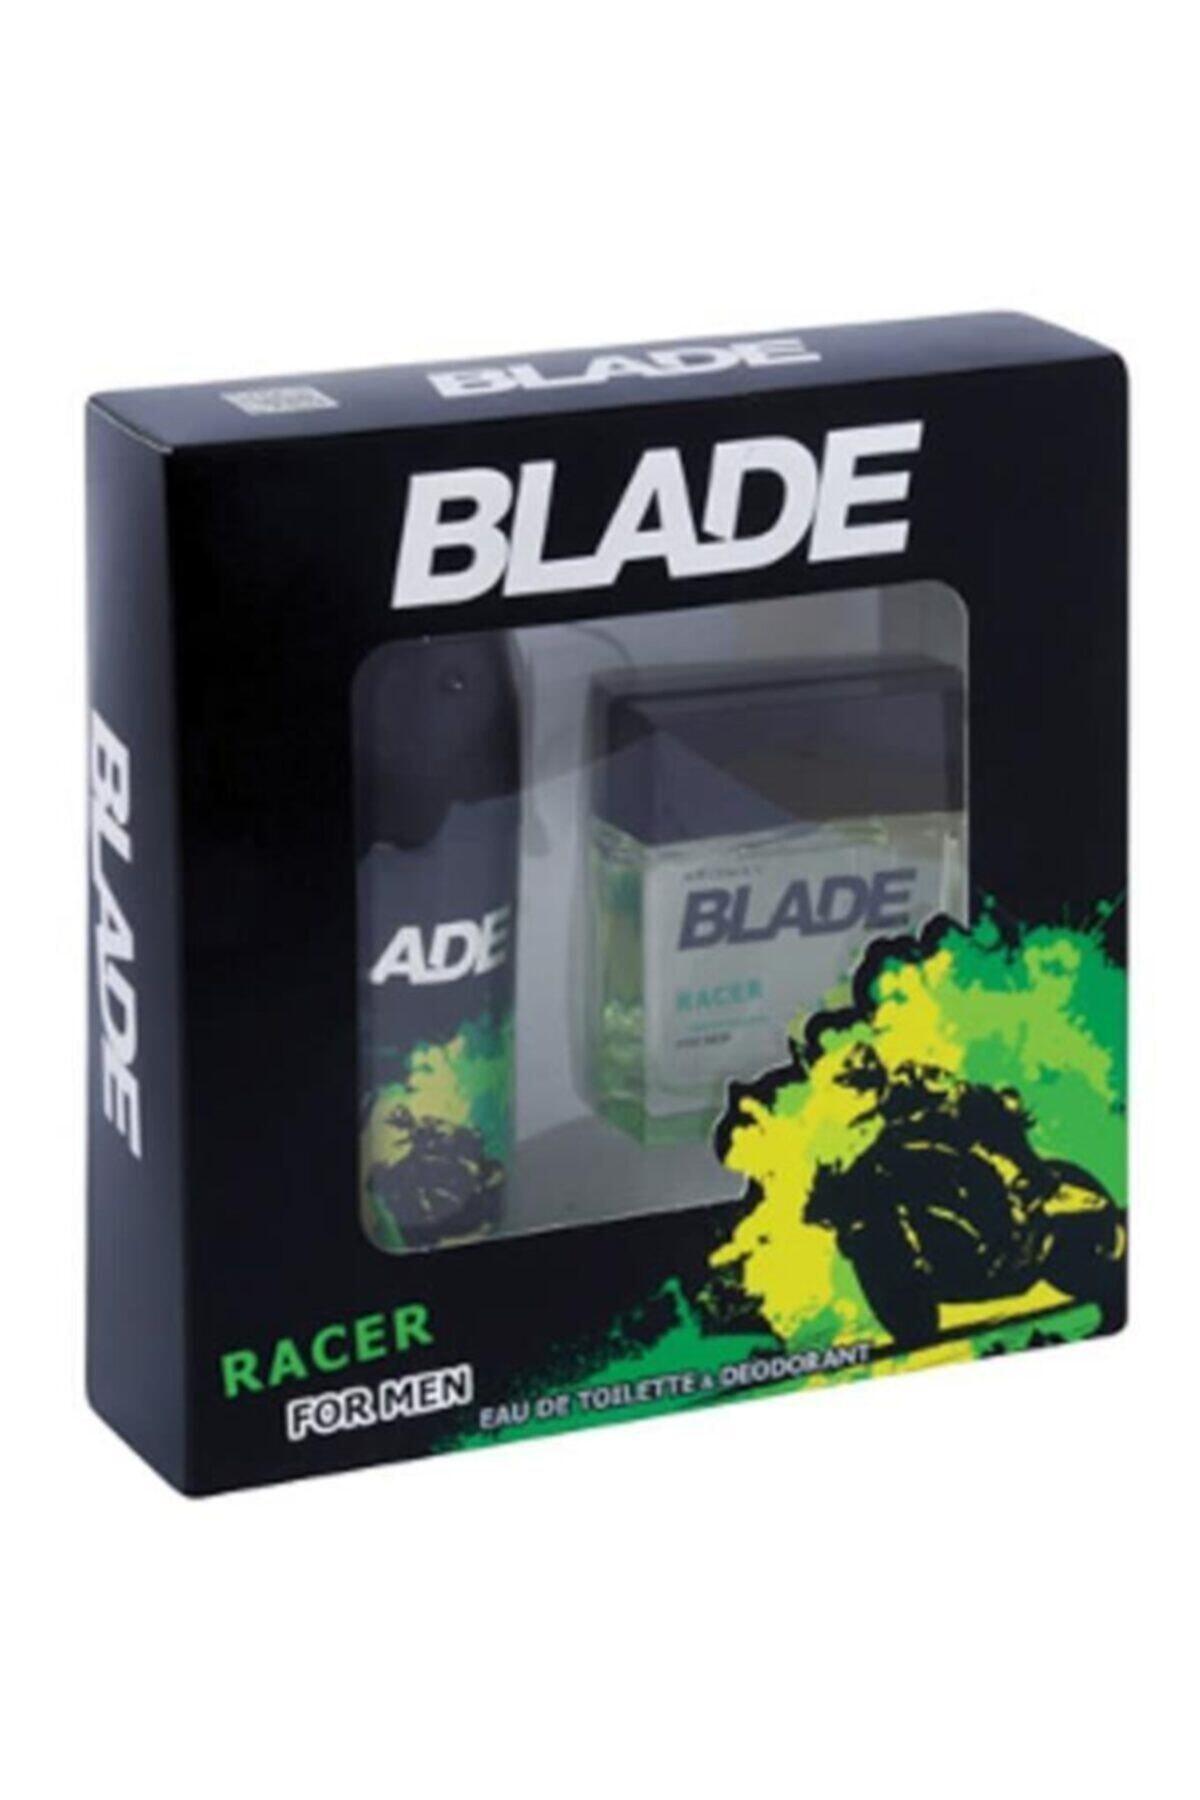 Blade Racer Edt Erkek Parfüm 100 Ml & Deodorant 150 Ml 1